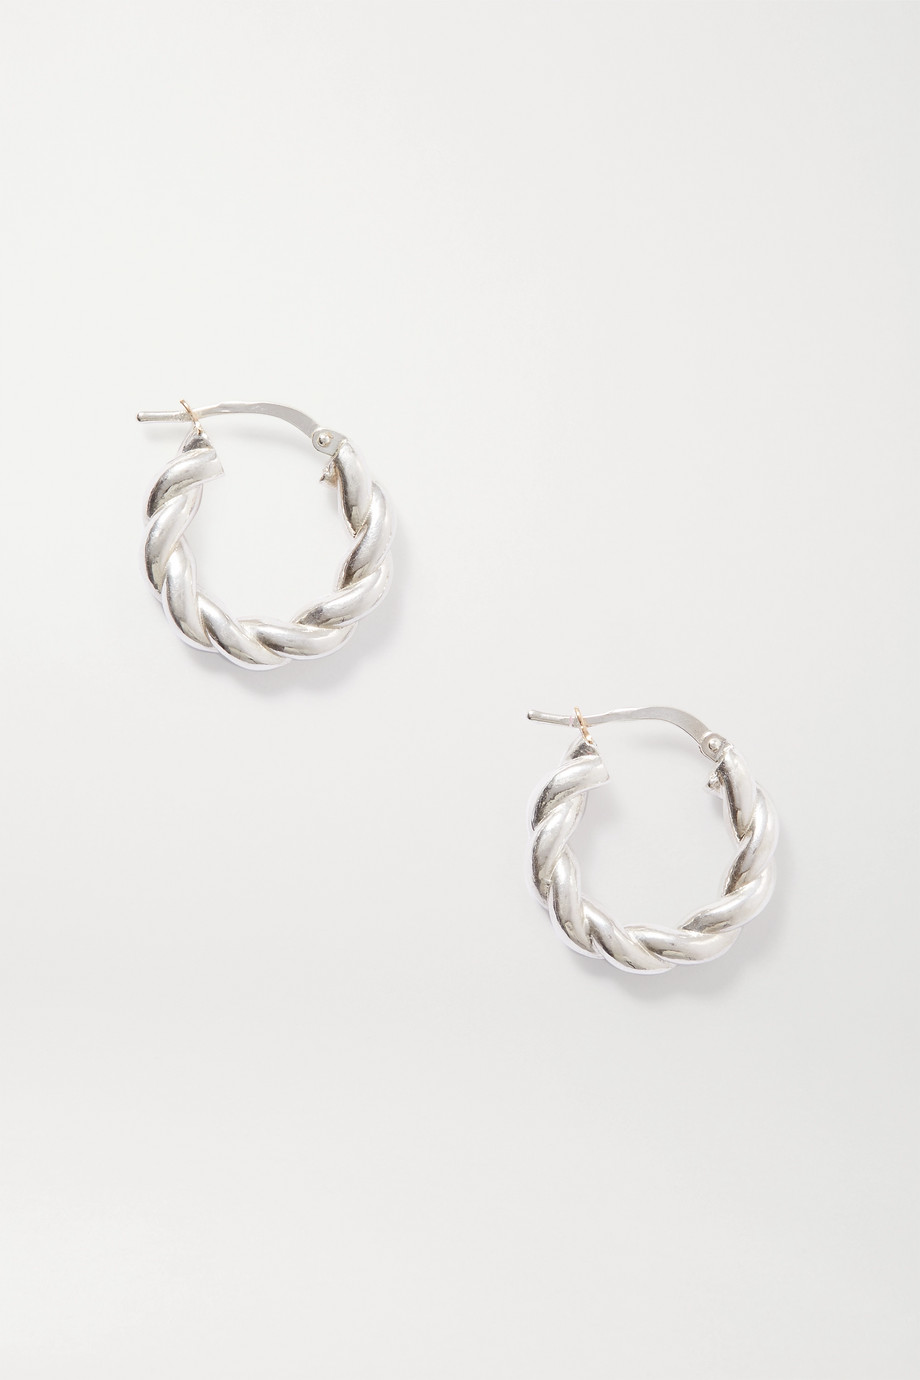 Bottega Veneta Silver hoop earrings